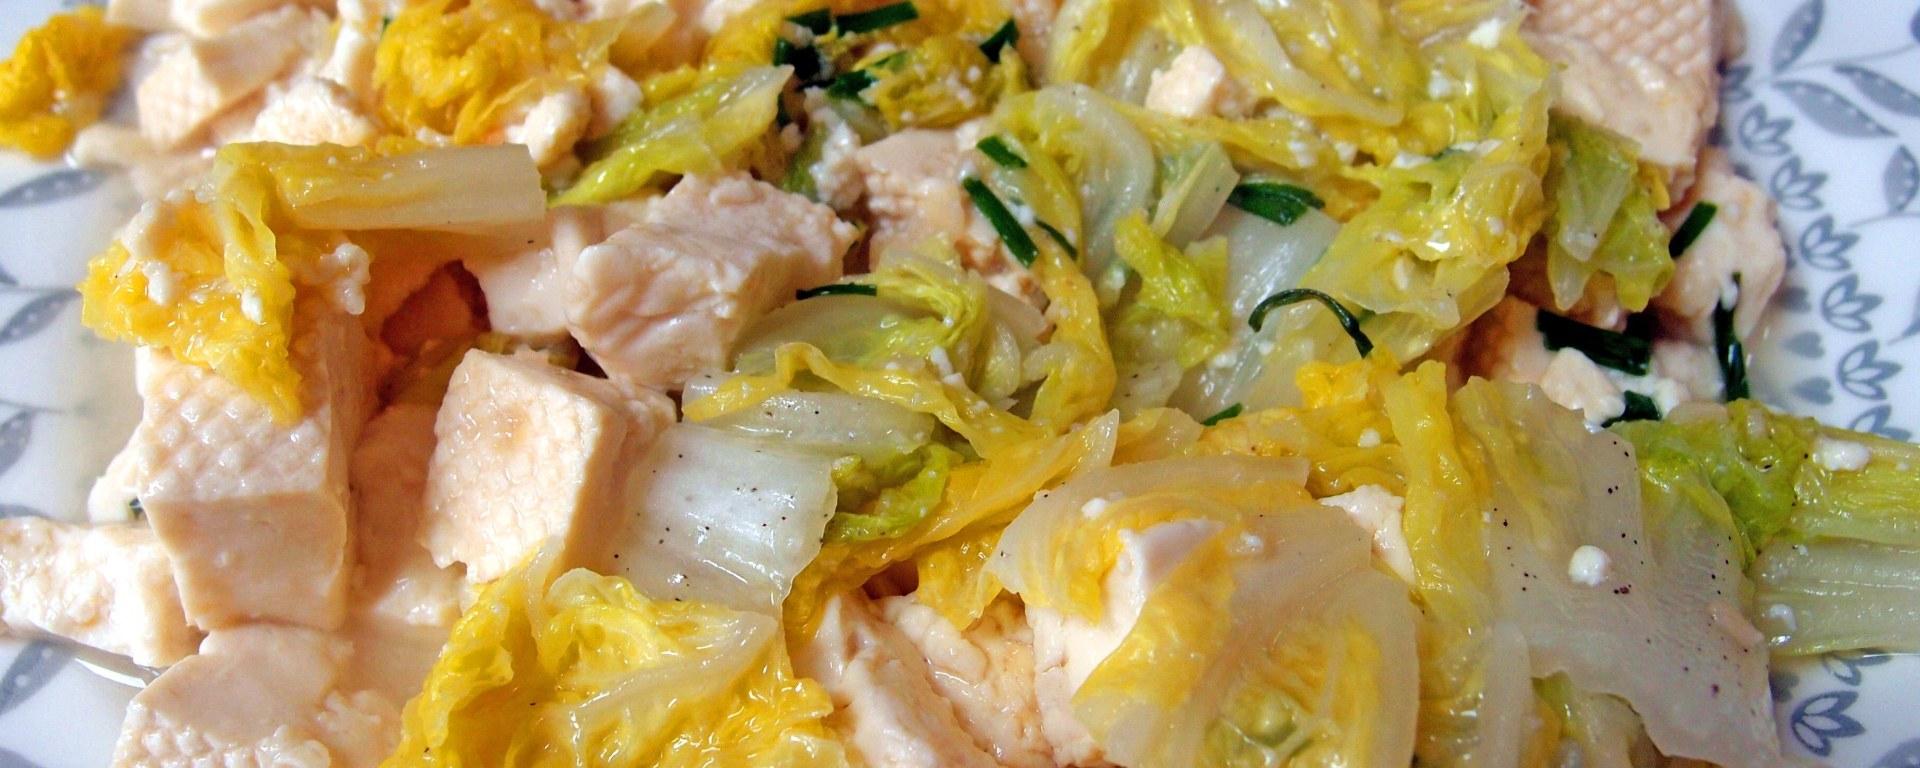 Tofu and Chinese Cabbage